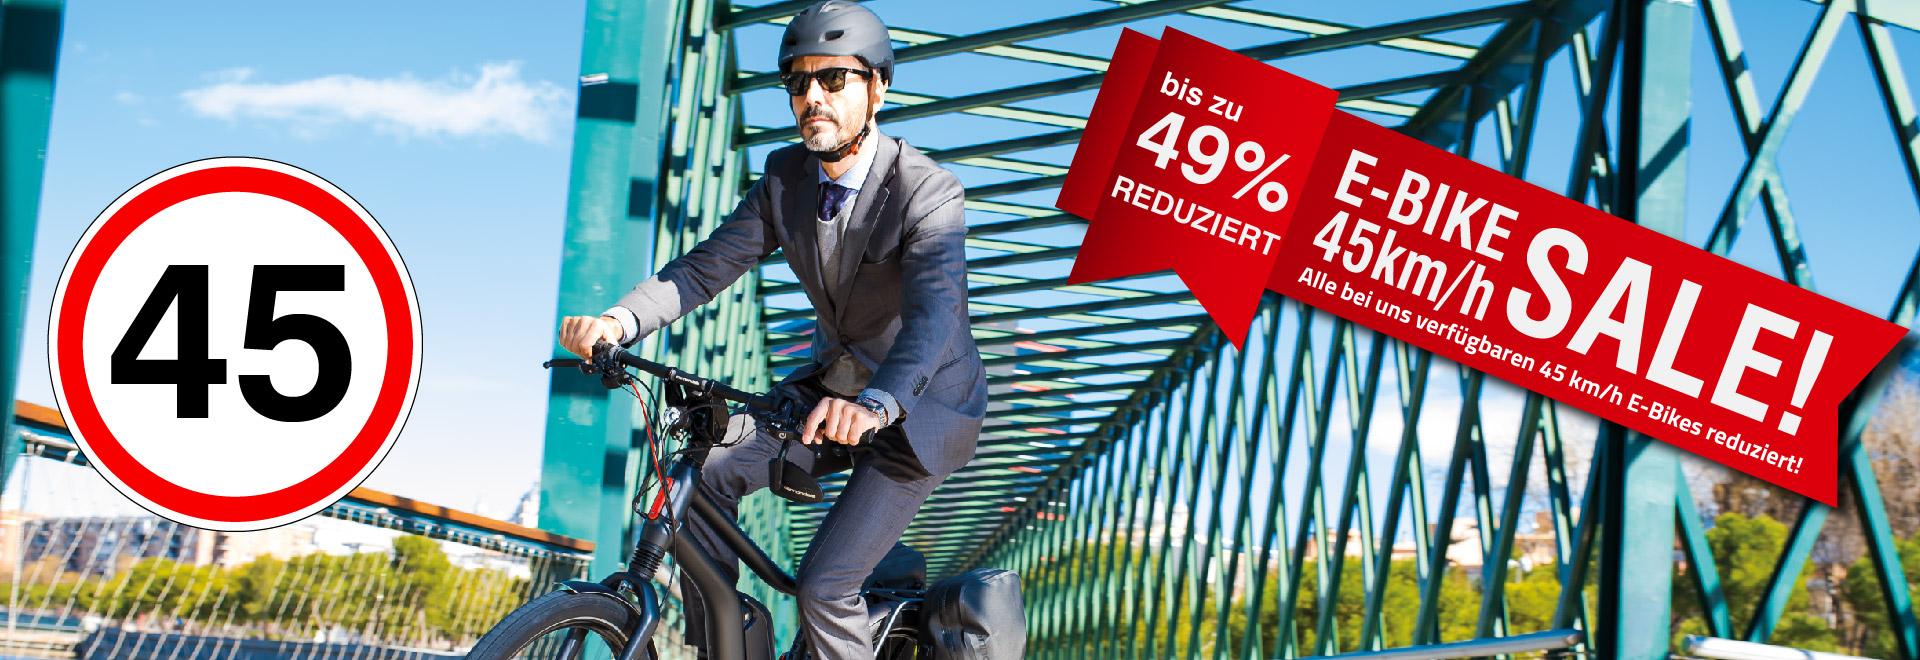 Alles muss Raus E-Bike 45km/h Sale